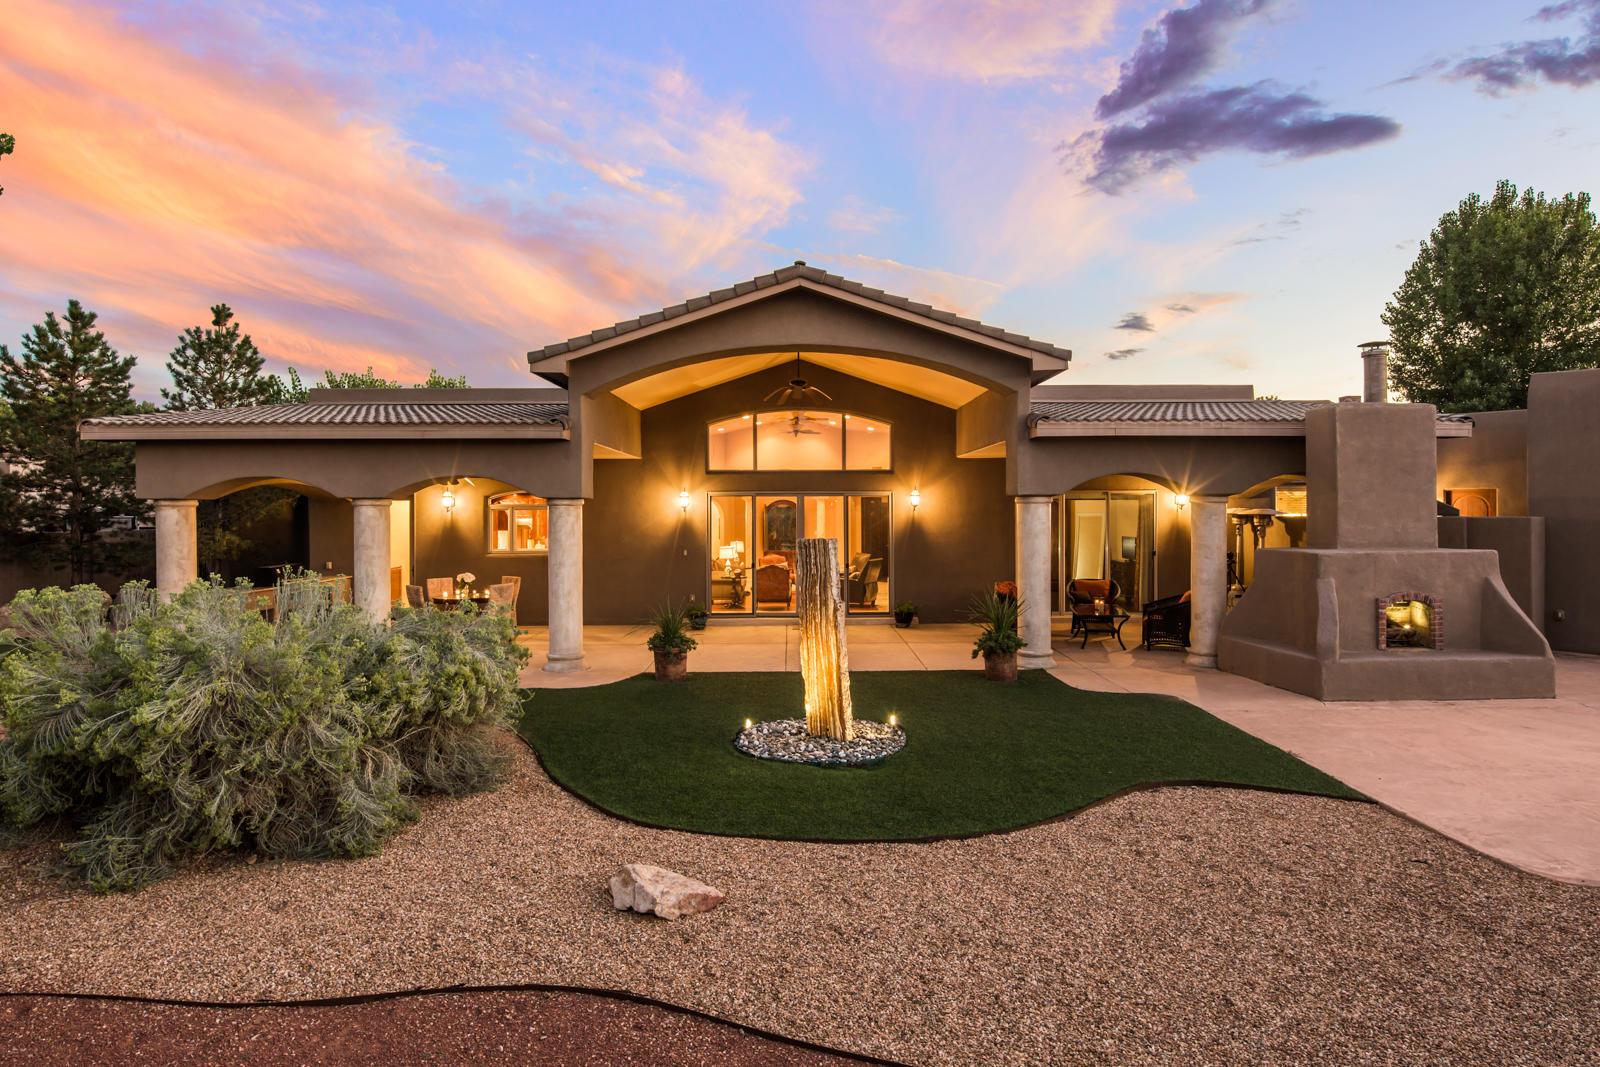 306 Plaza Consuelo Property Photo - Bernalillo, NM real estate listing